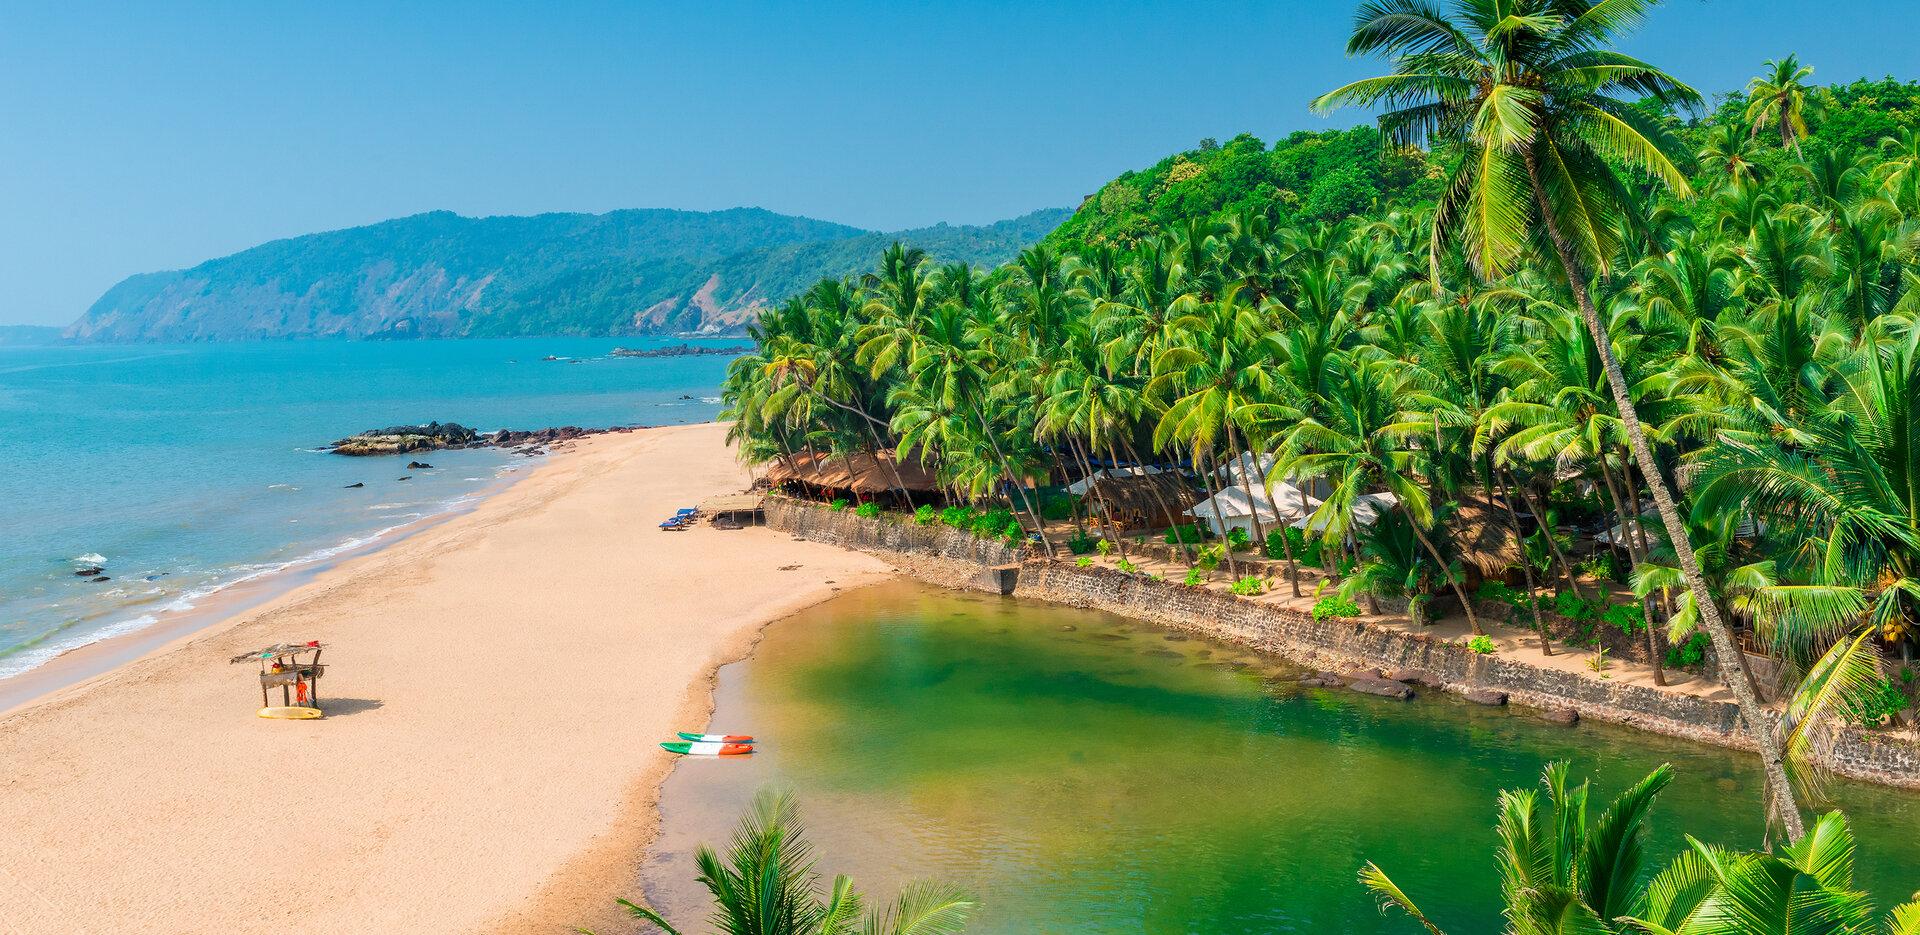 Explore Goa with Club Mahindra